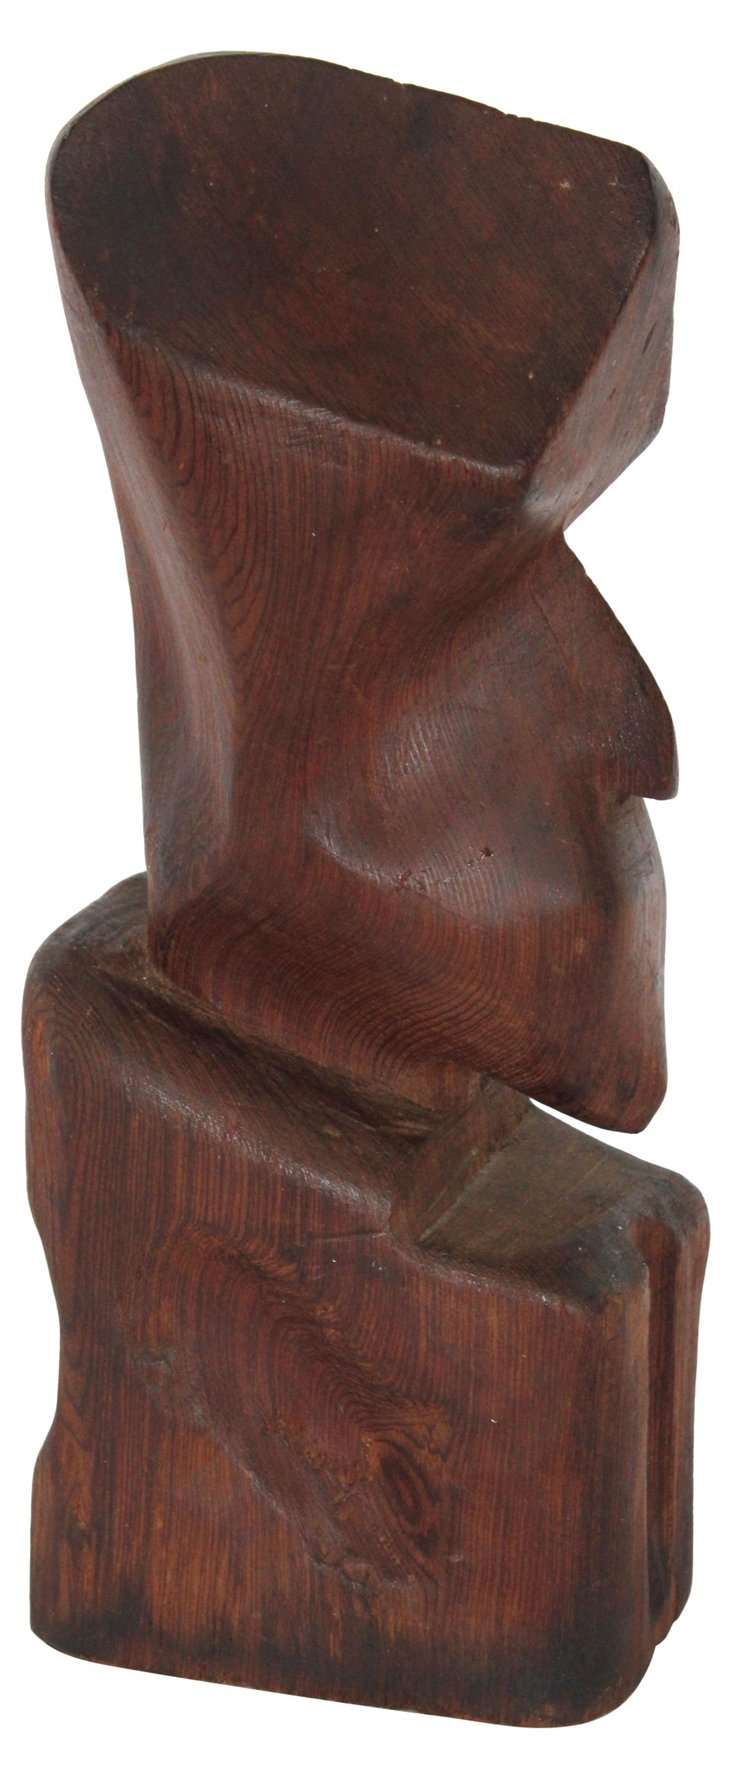 Midcentury Figure by Pete Klimansky